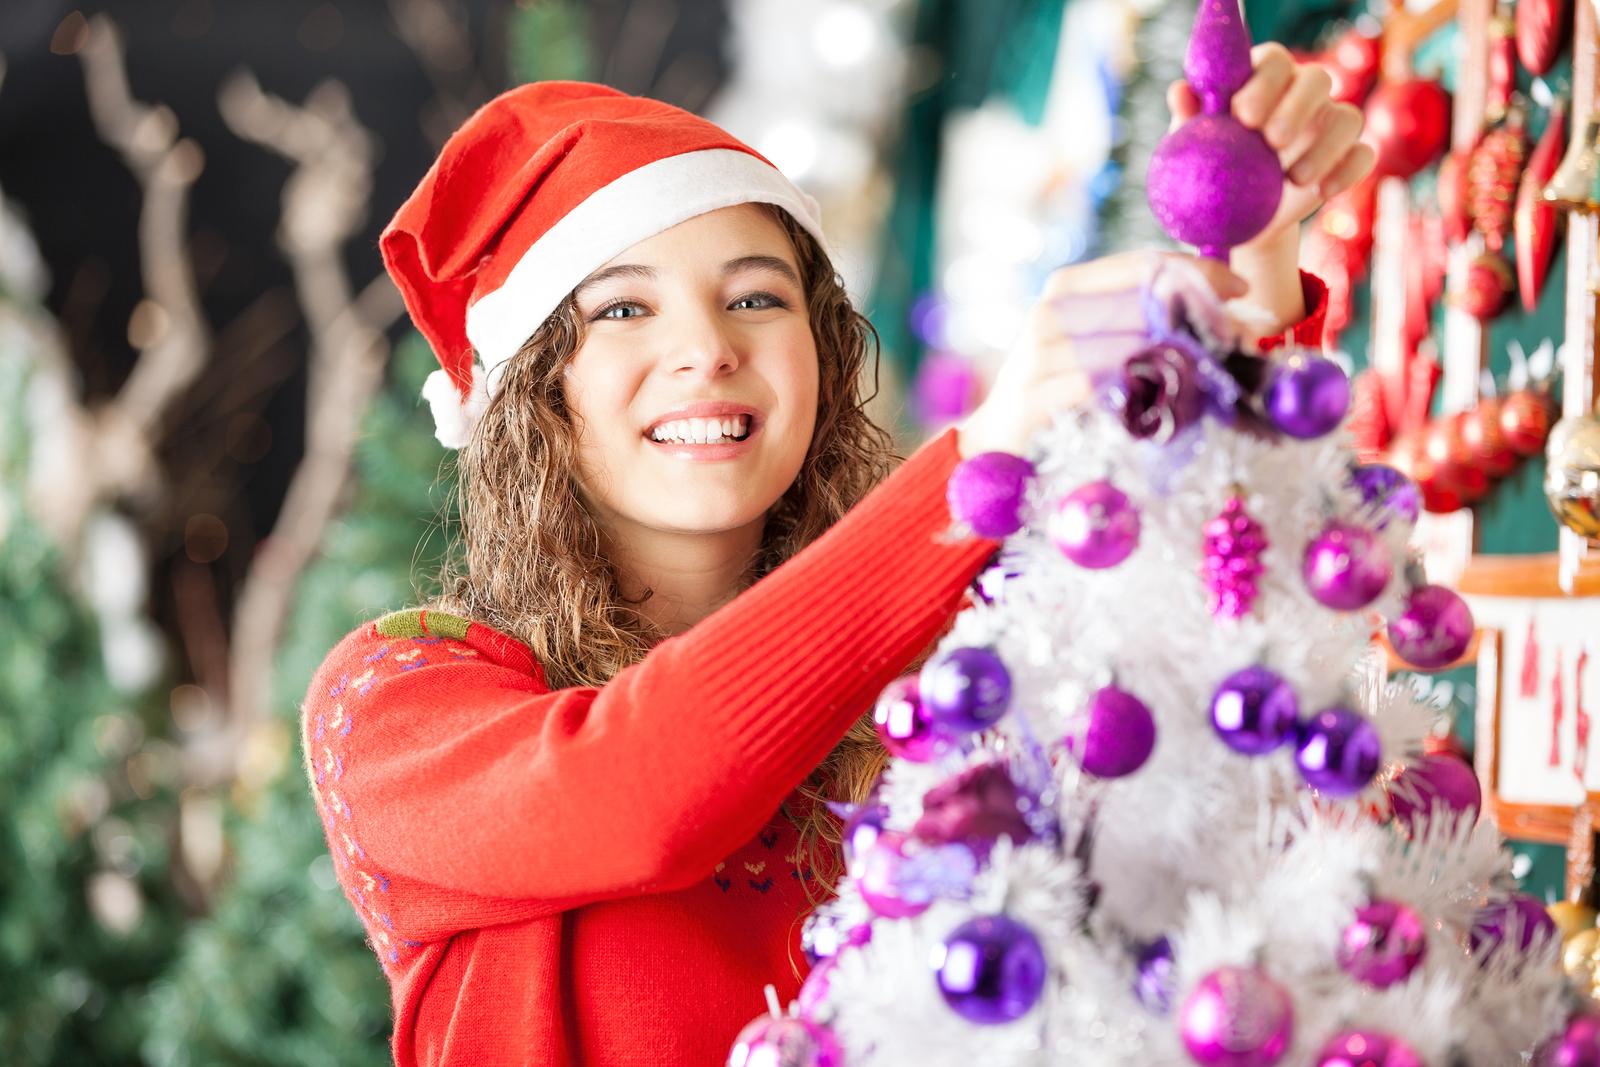 Holiday Hiring is Already Underway for Seasonal Retail Jobs